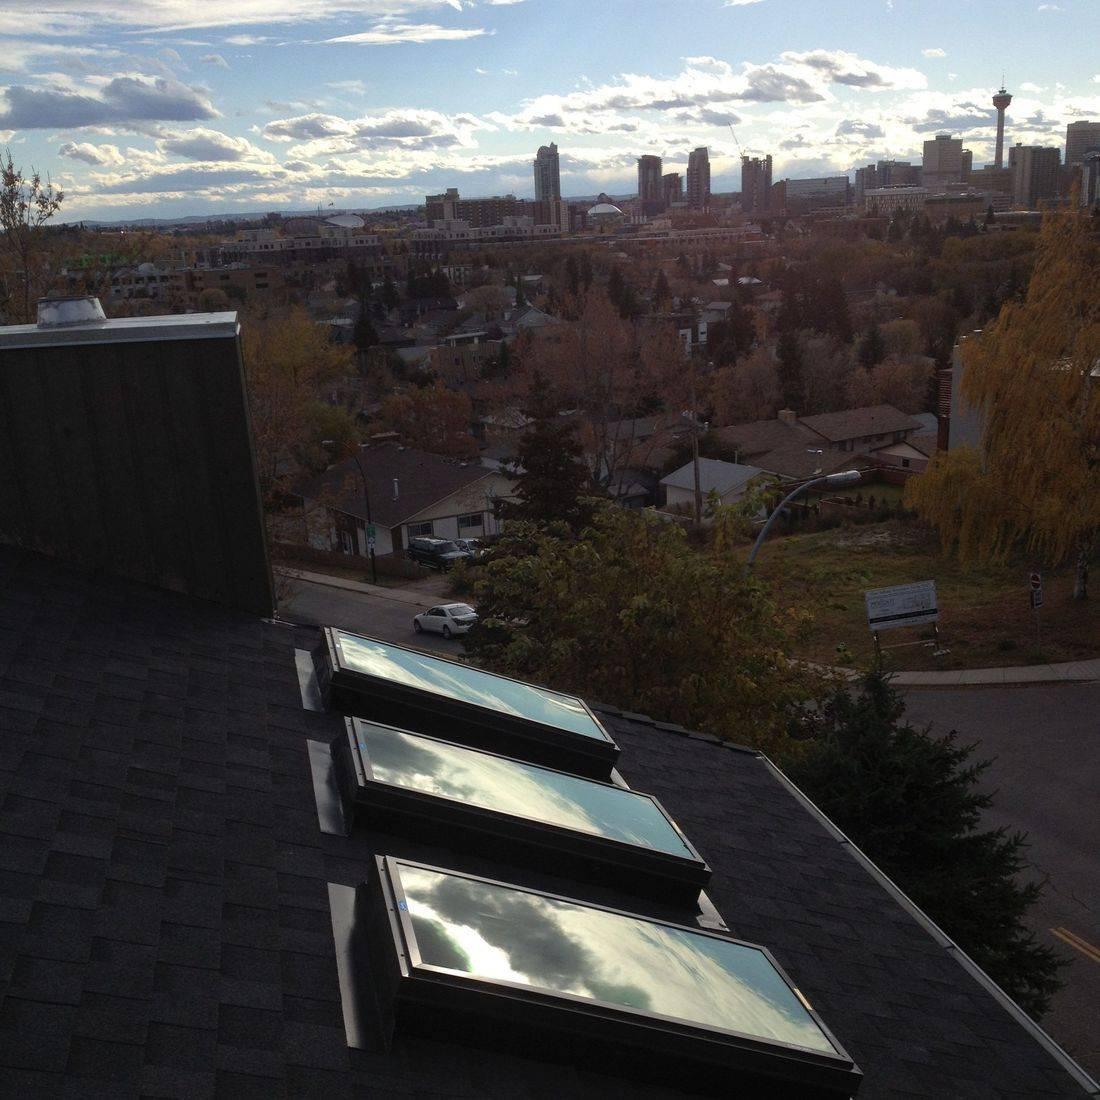 basement escavation snow removal renovation kitchen bathroom asbestos decks mre calgary construction railings